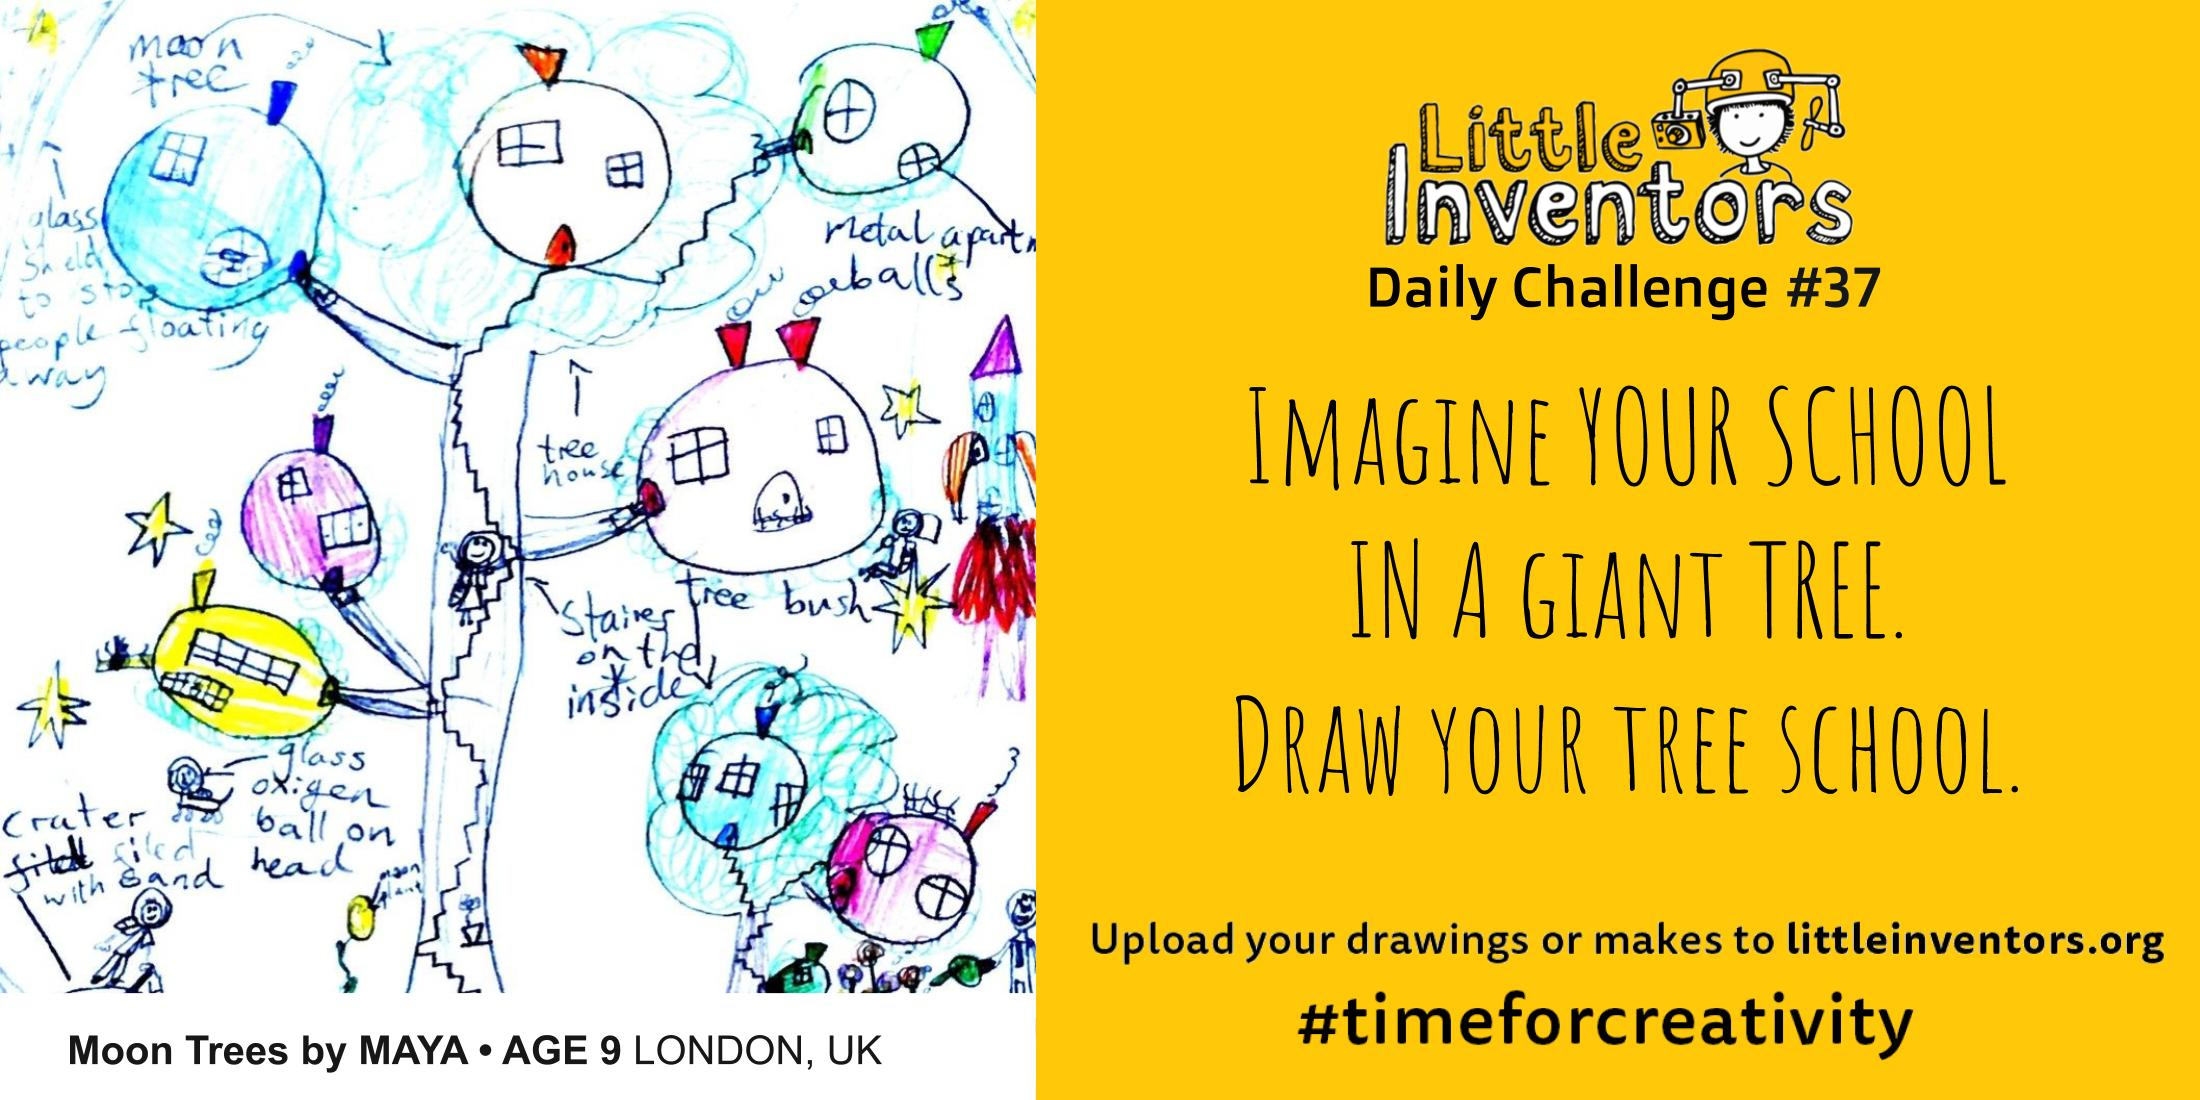 Little Inventors Challenge 37 : Imagine YOUR SCHOOL IN A giant TREE. Draw your tree school.